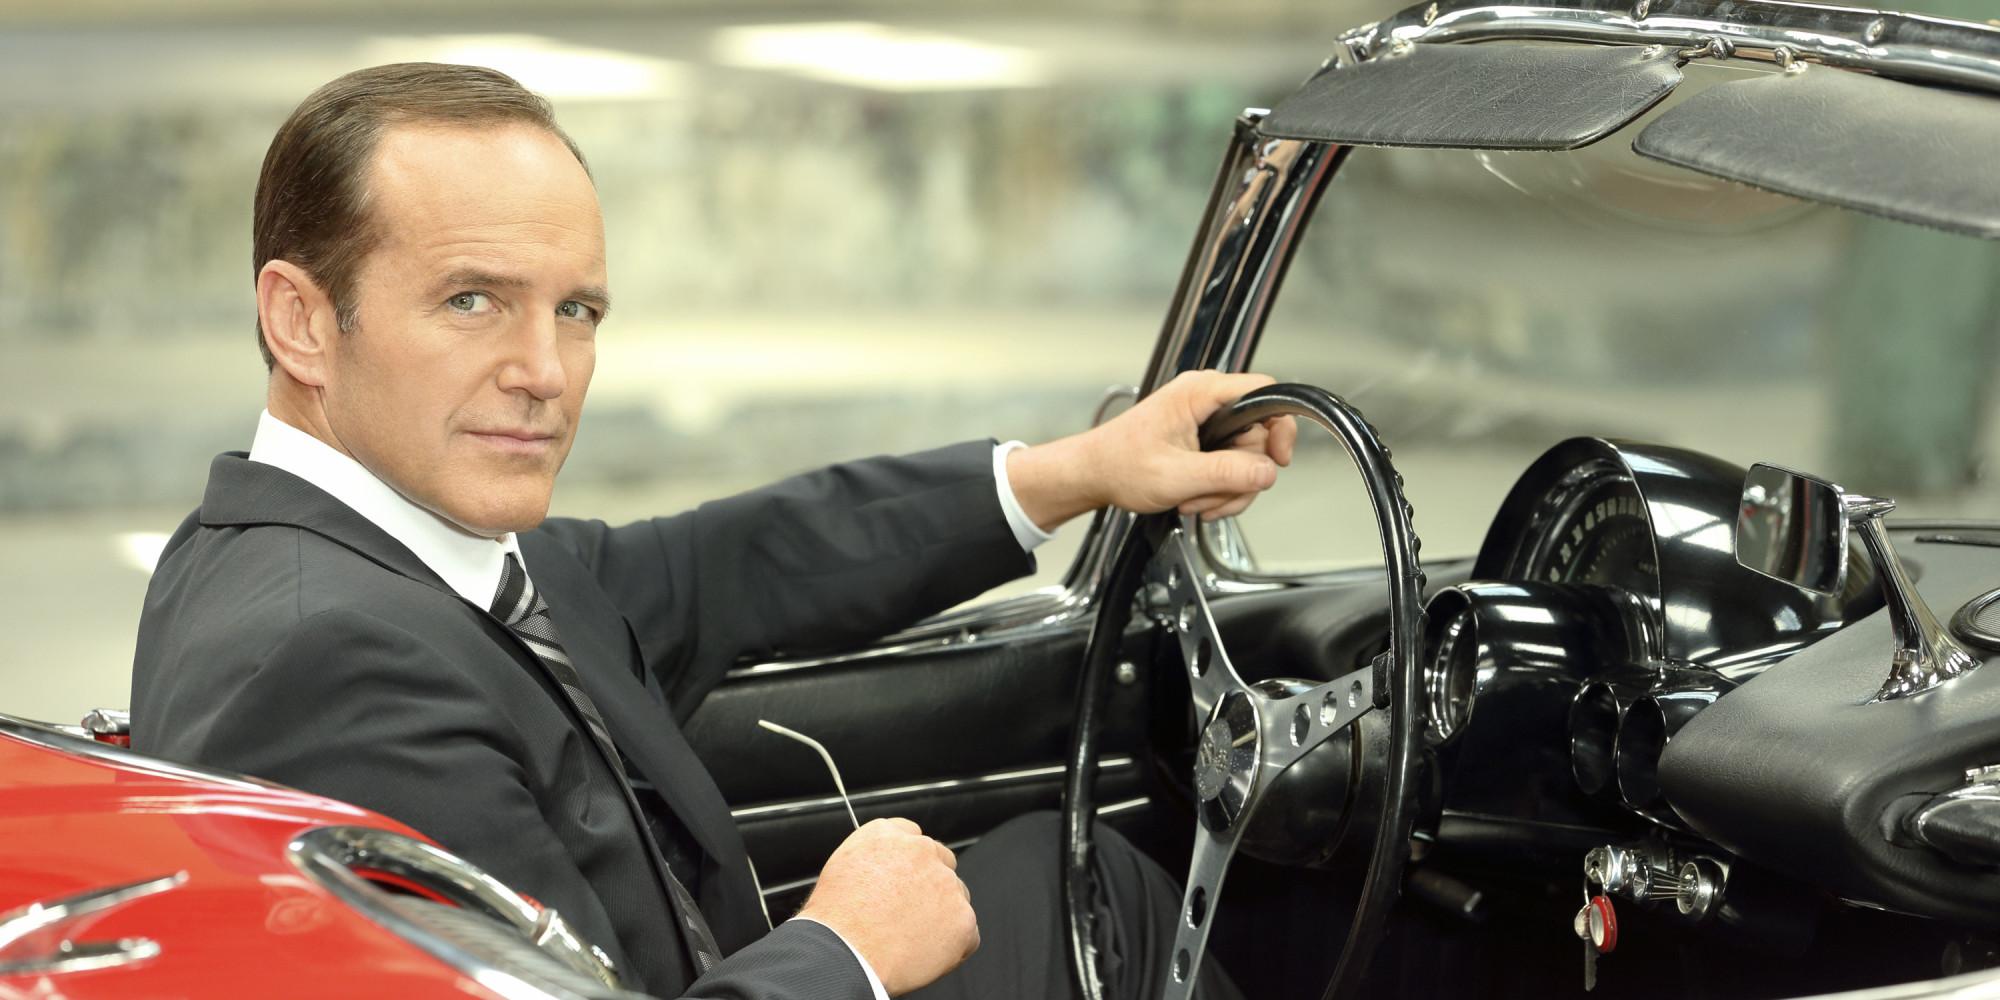 "MARVEL'S AGENTS OF S.H.I.E.L.D. - ABC's ""Marvel's Agents of SHIELD"" stars Clark Gregg as Agent Phil Coulson. (ABC/Bob D'Amico)"